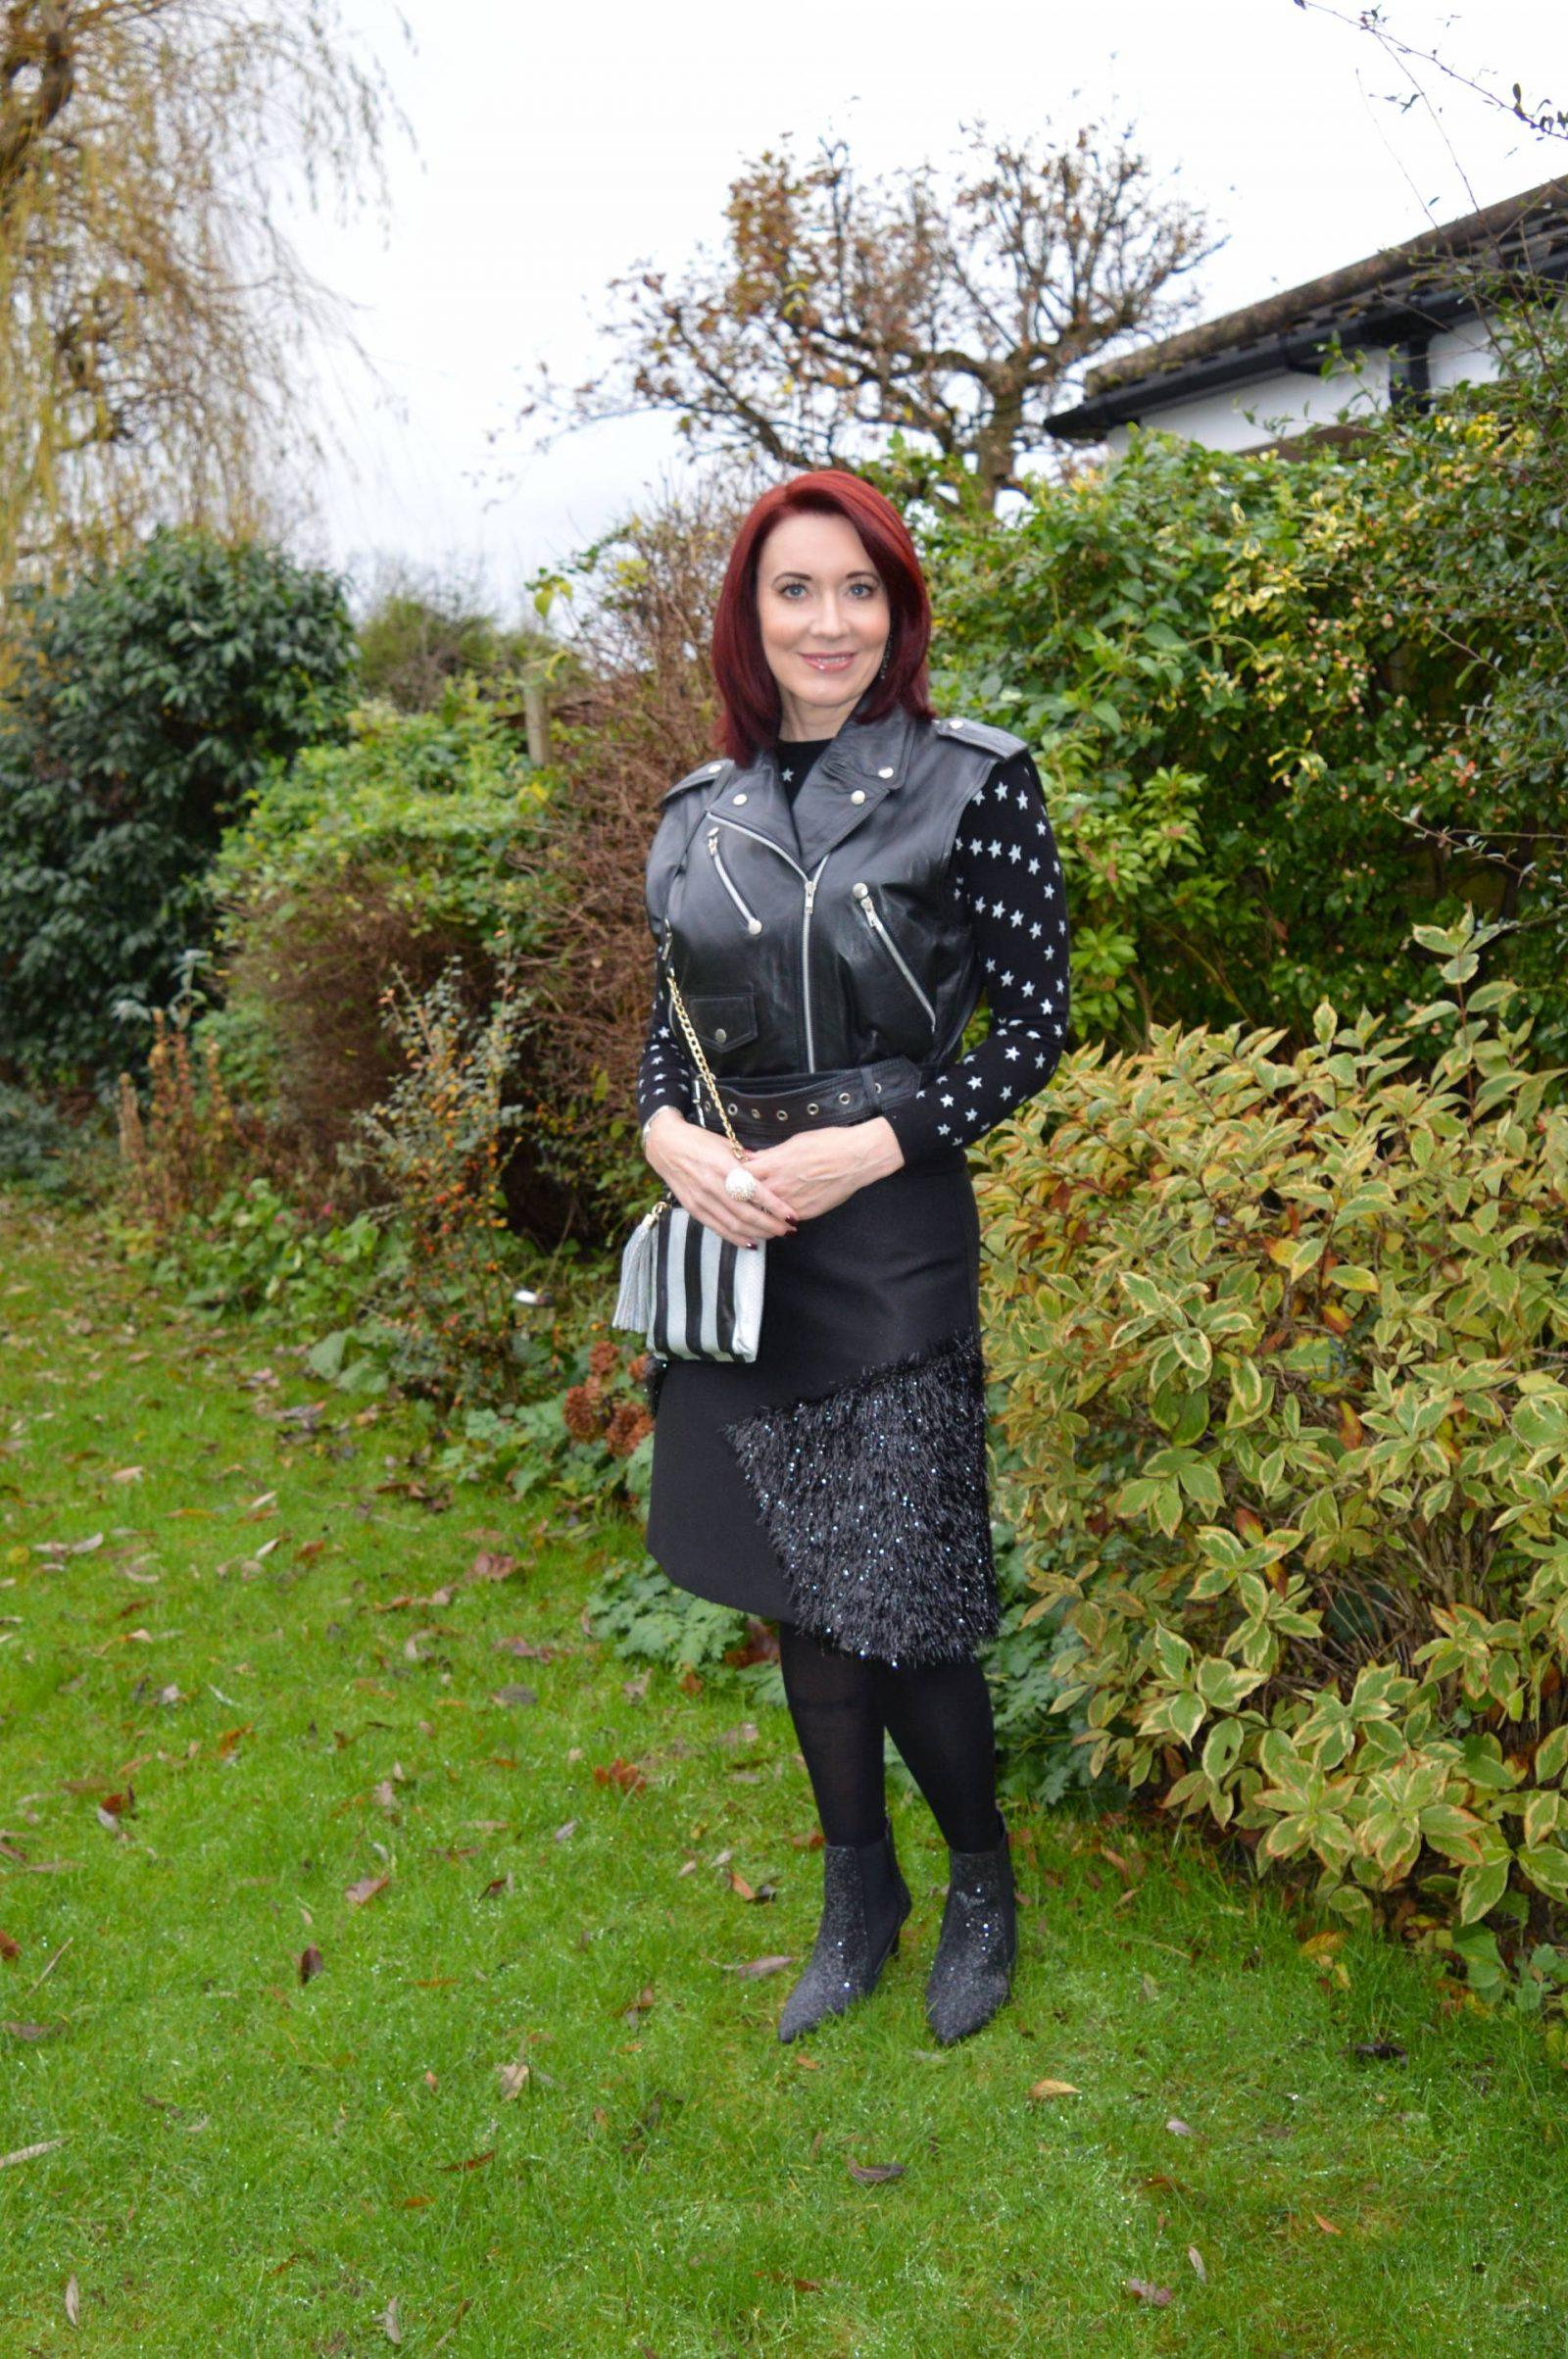 Black Tinsel Skirt, Glitter Boots and Star Jumper + Link Up, Topshop tinsel skirt, Marks and Spencer star jumper